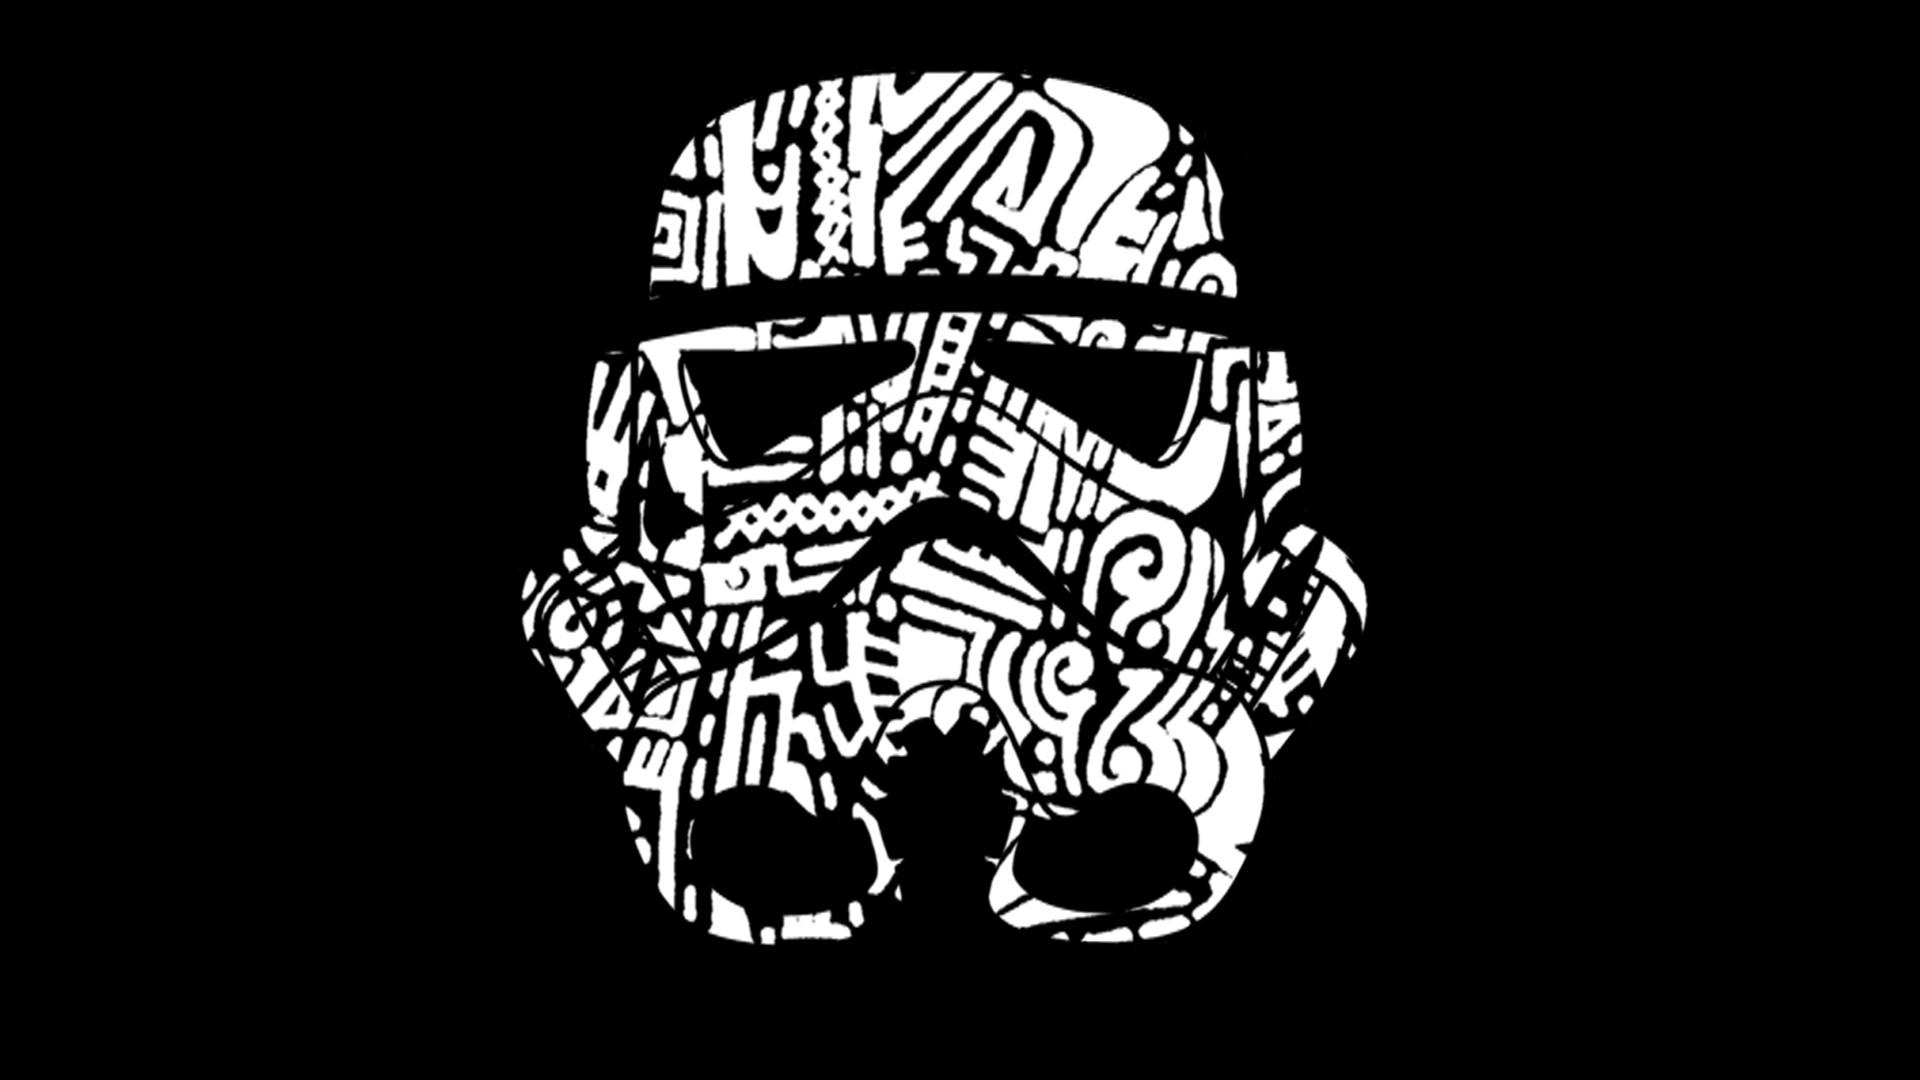 Wallpaper drawing illustration star wars logo skull head drawing illustration star wars monochrome logo skull head clone trooper black and white monochrome photography font voltagebd Images